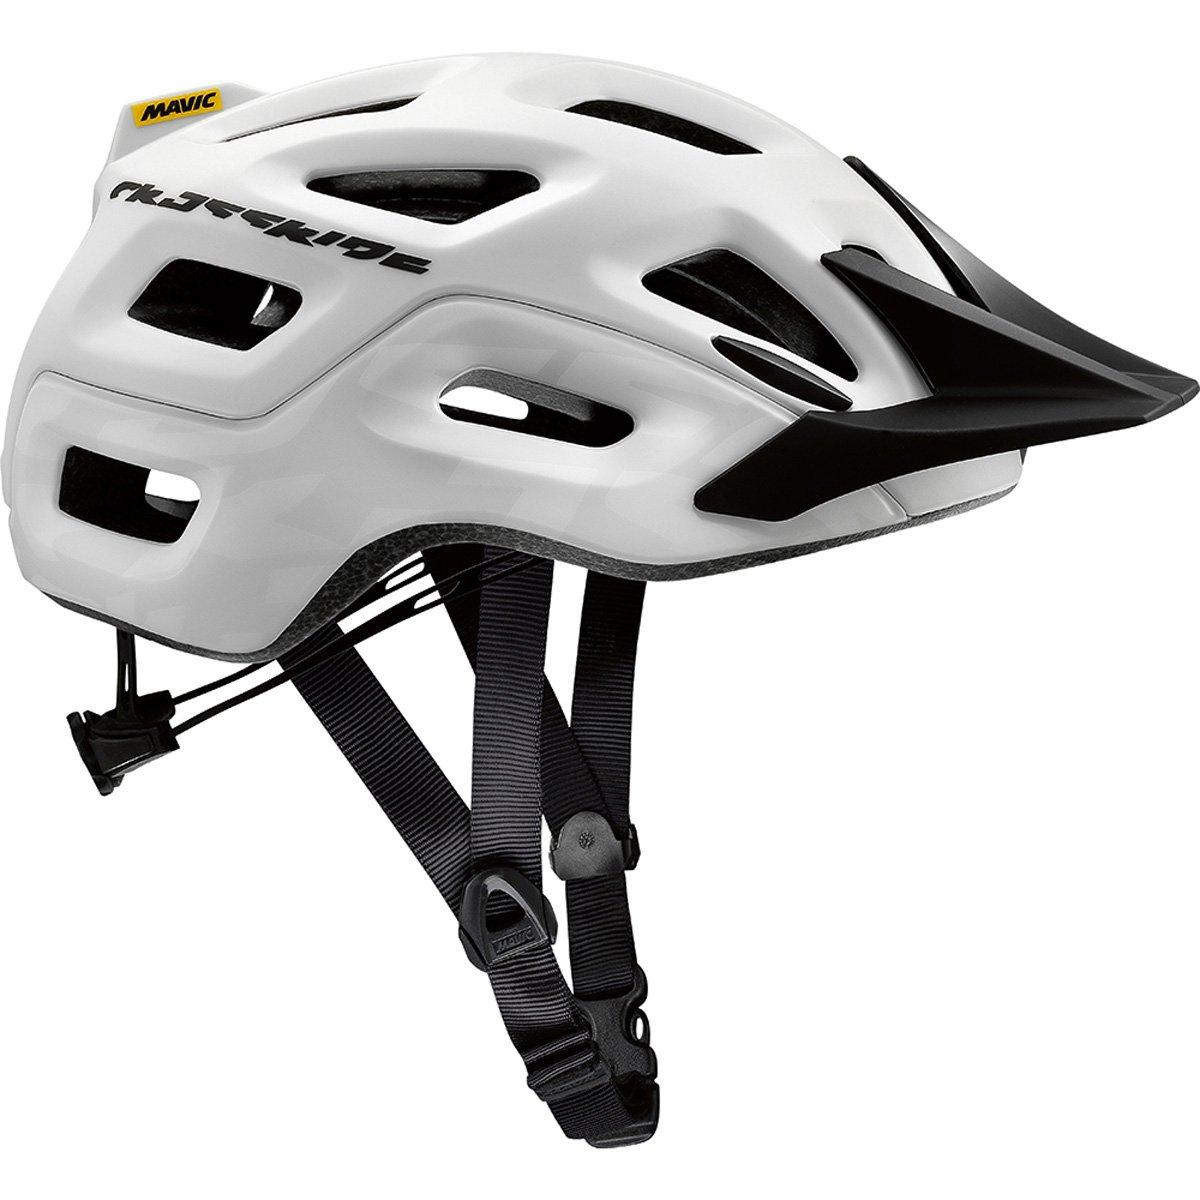 Mavic Crossride MTB Fahrrad Helm weiß 2018